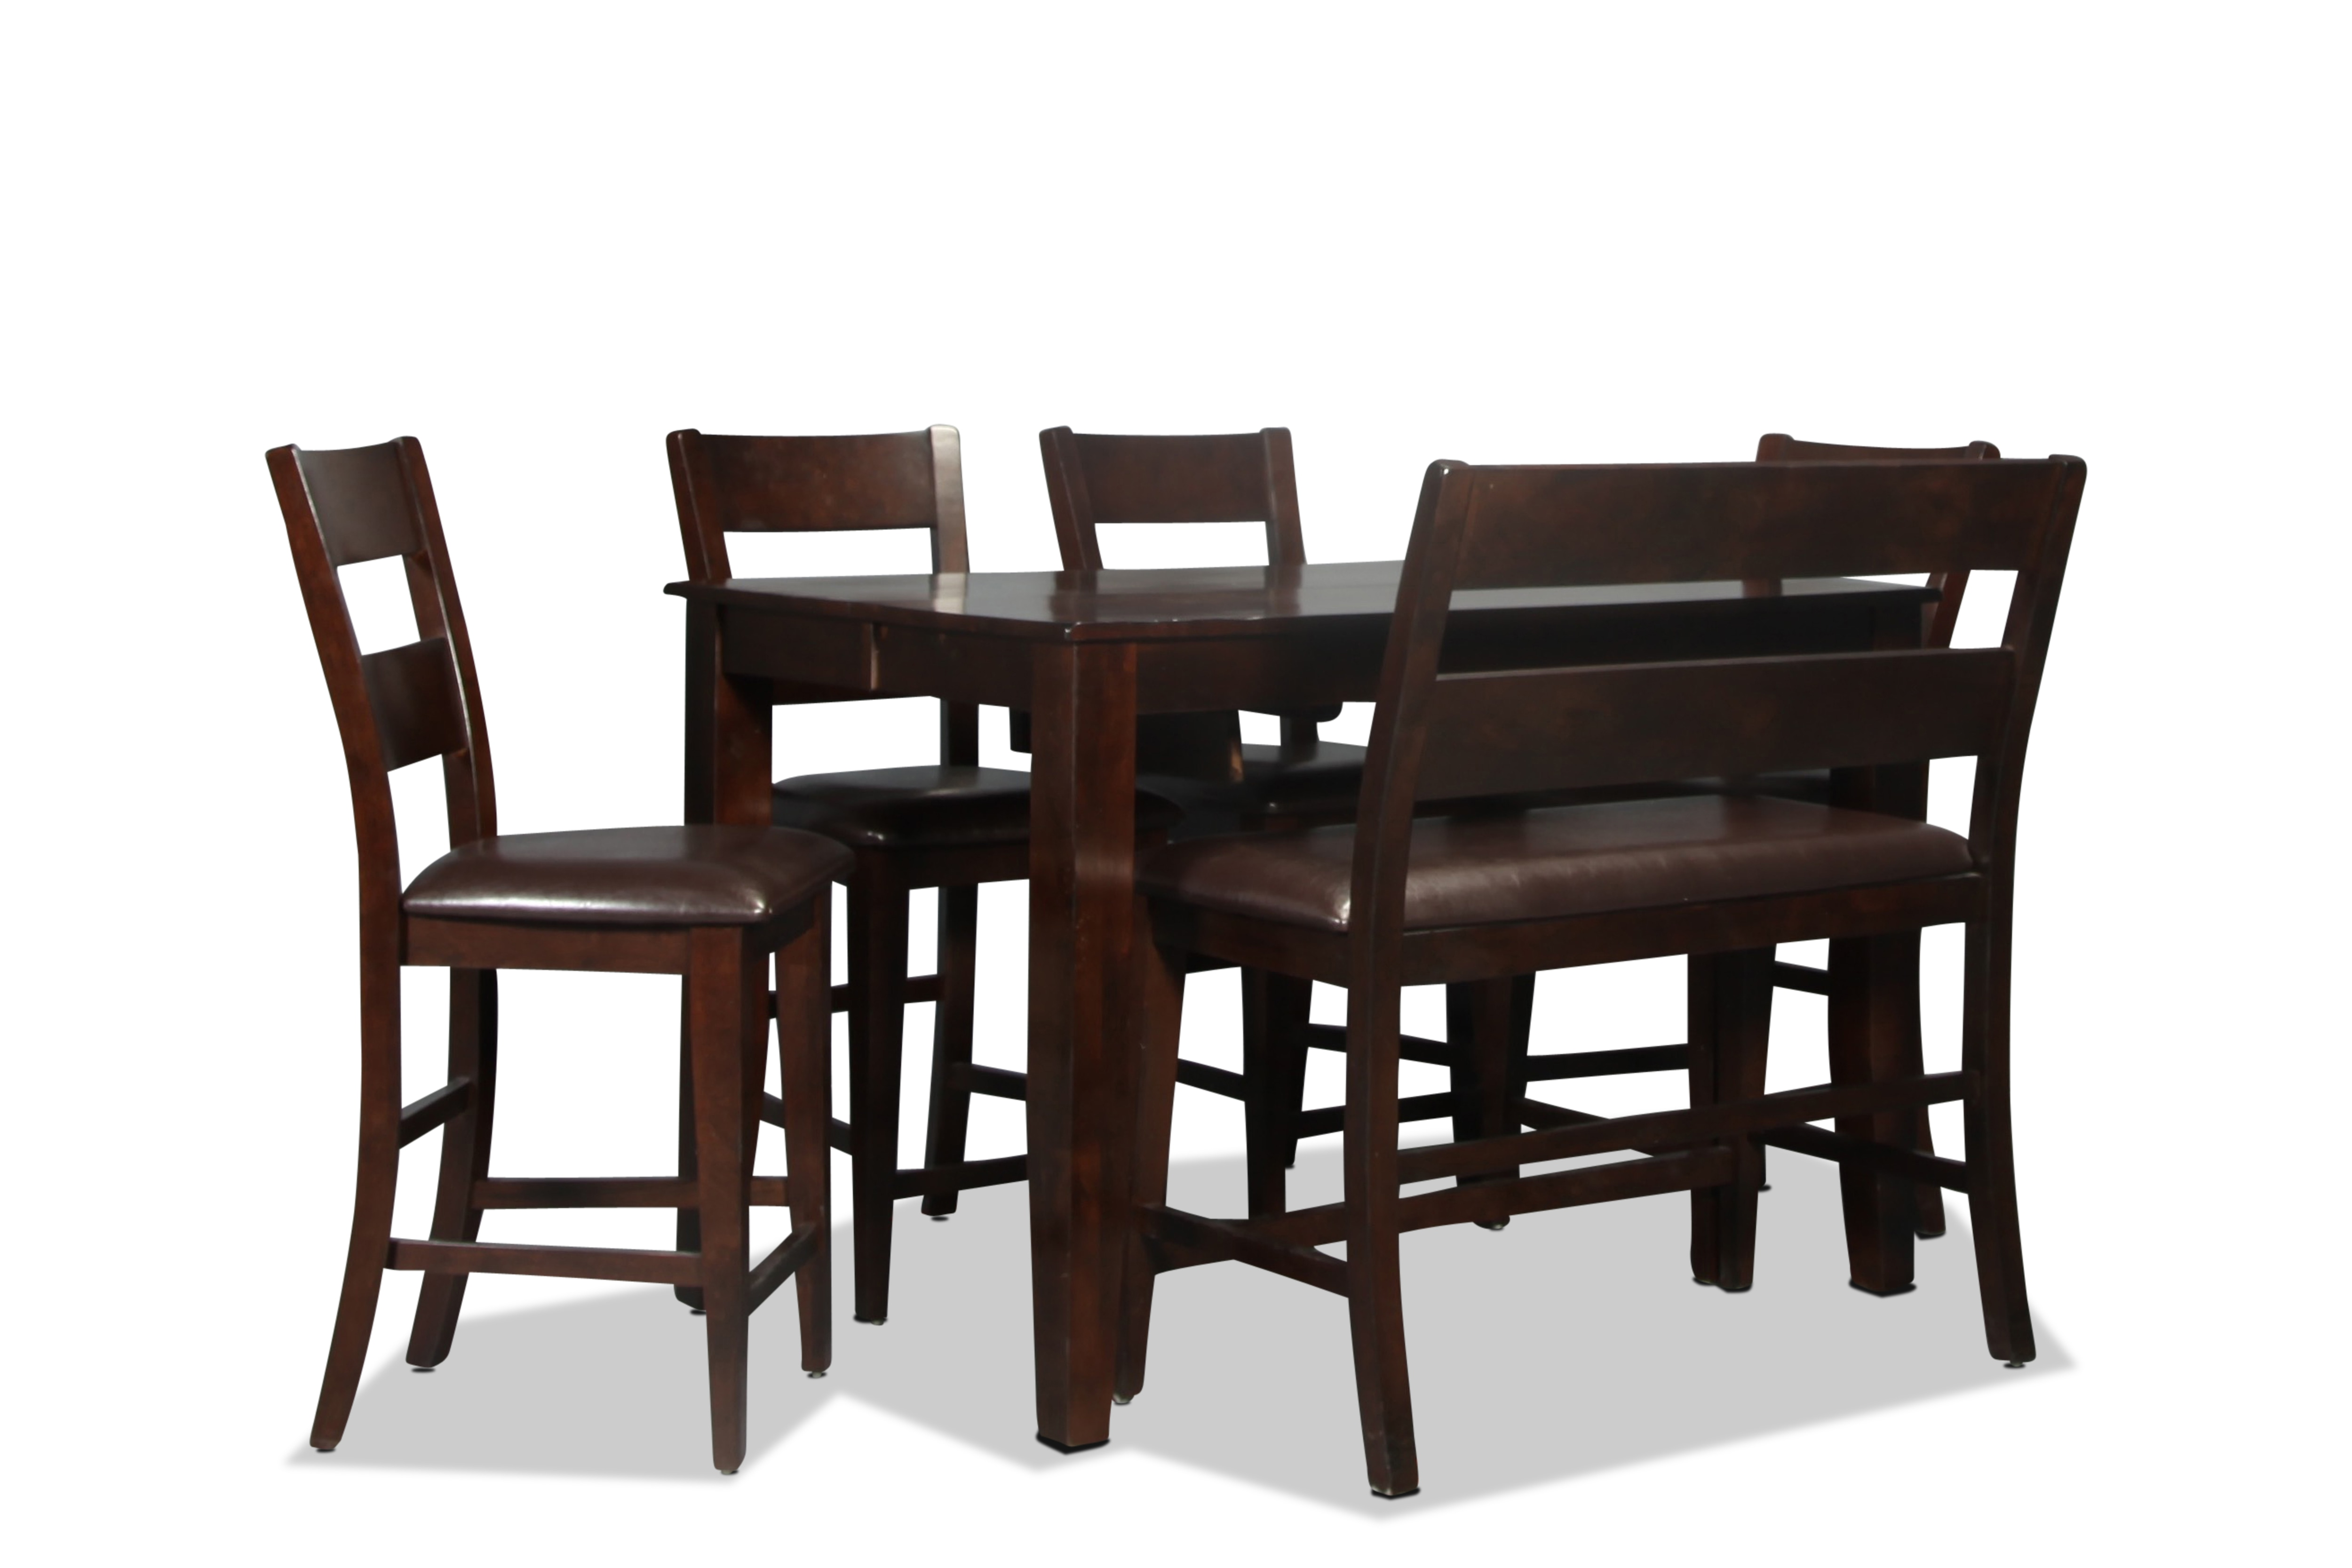 Urban View Pub Table and 4 Pub Chairs - Dark Cherry